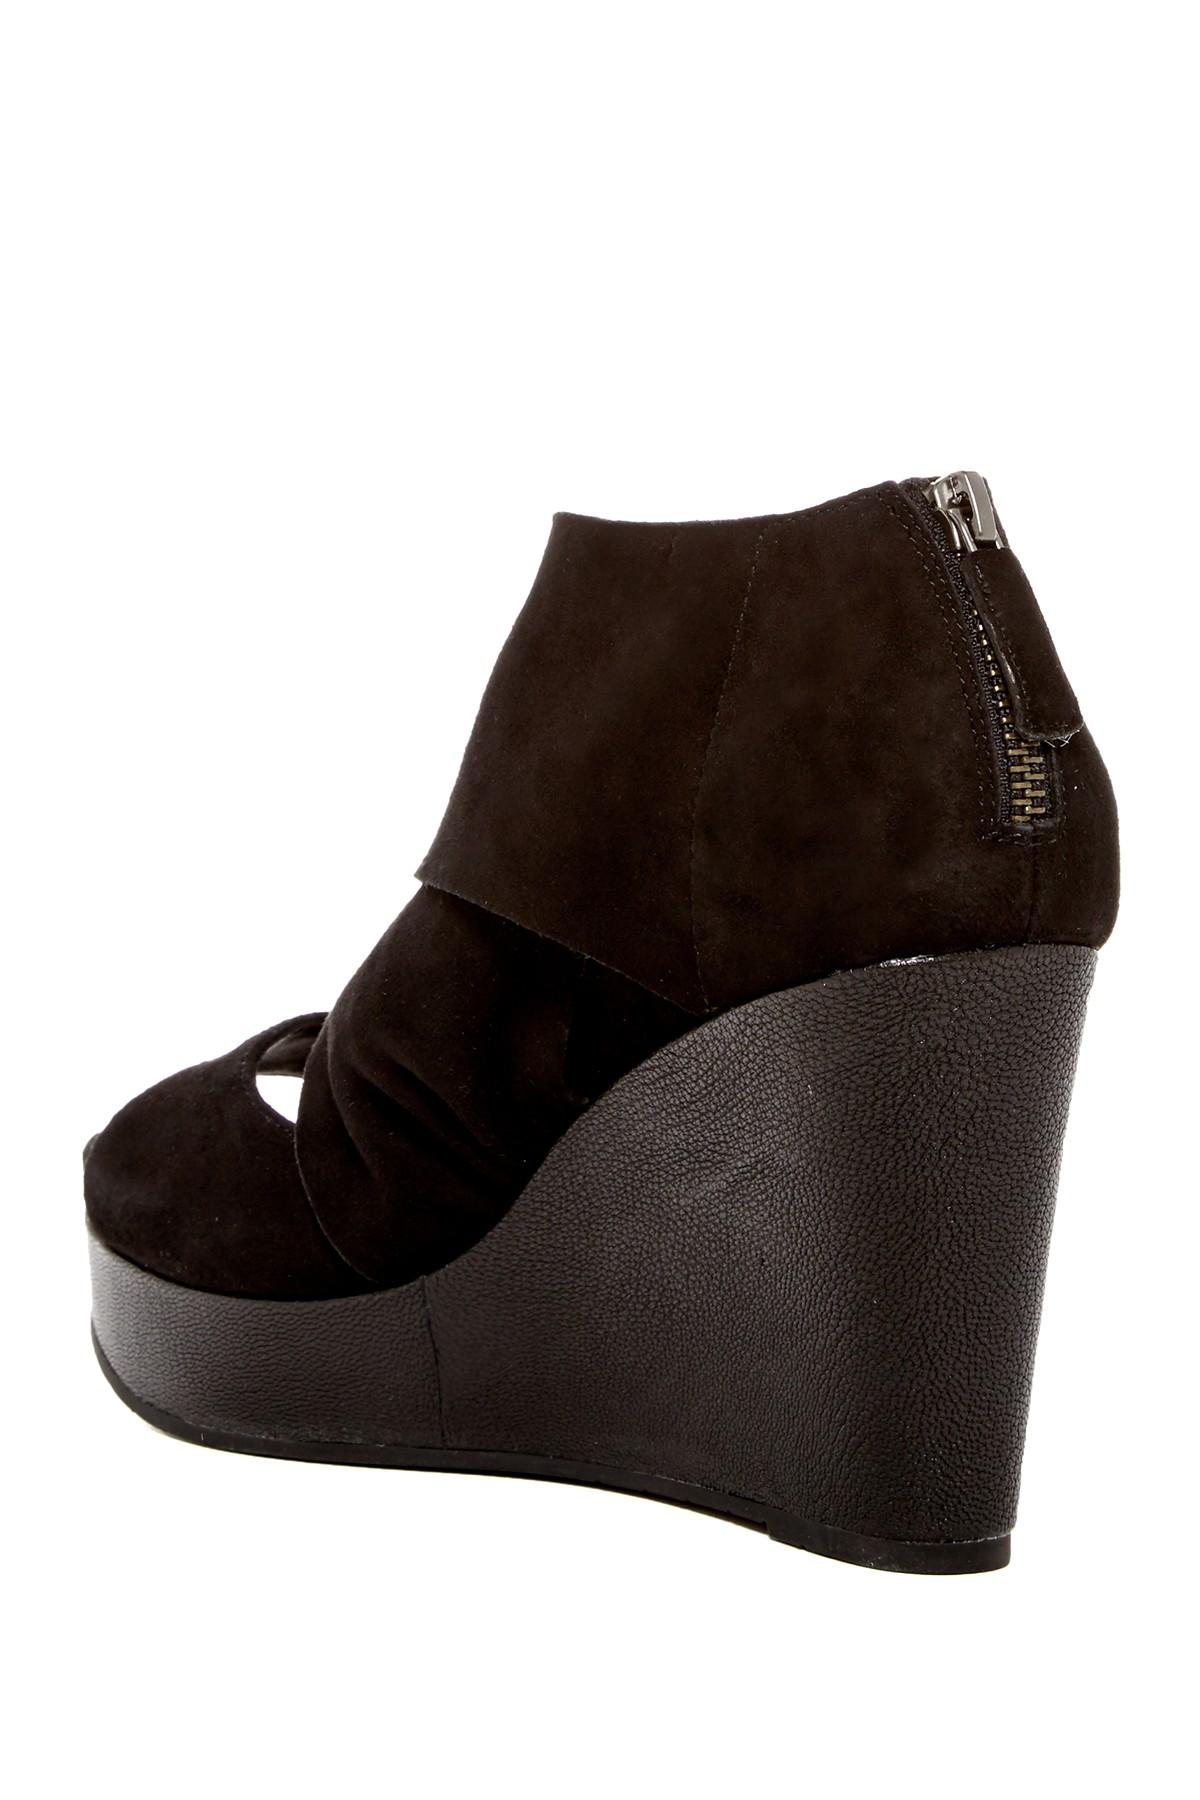 Donald Pliner Leather Suede Heel Shoes